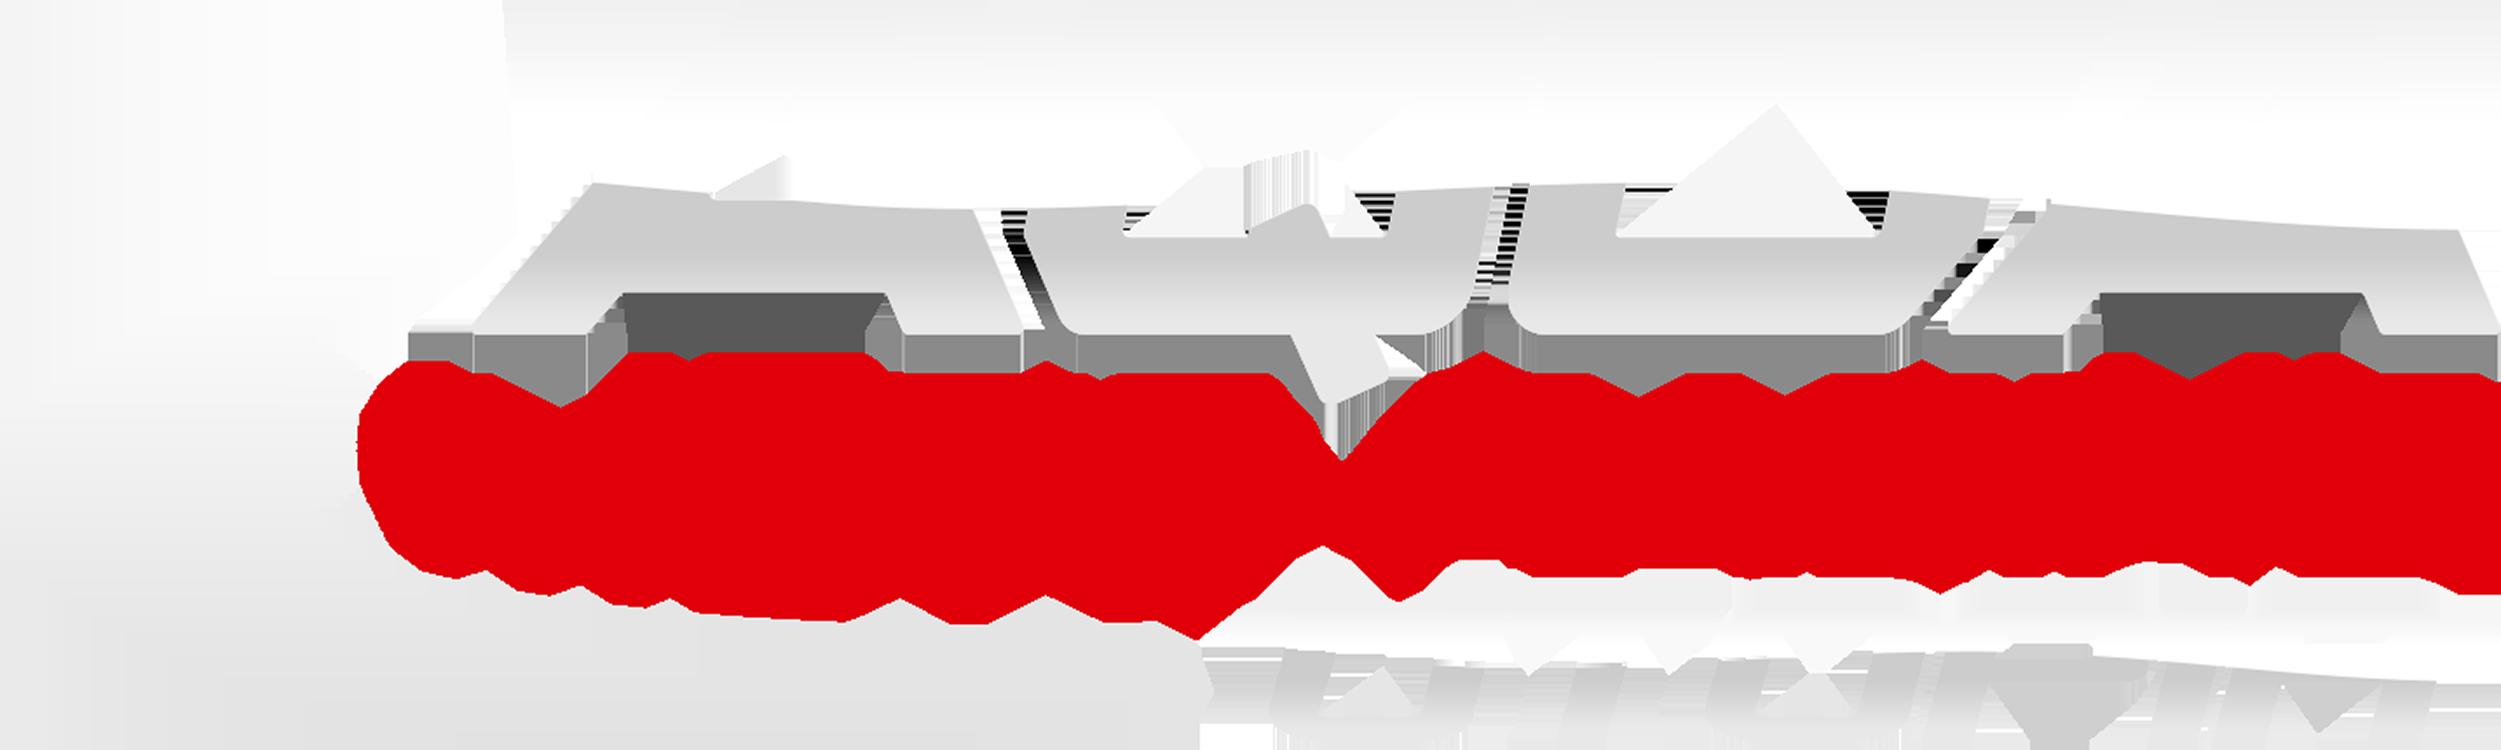 Aqua Moto Racing Utopia – Image  #1